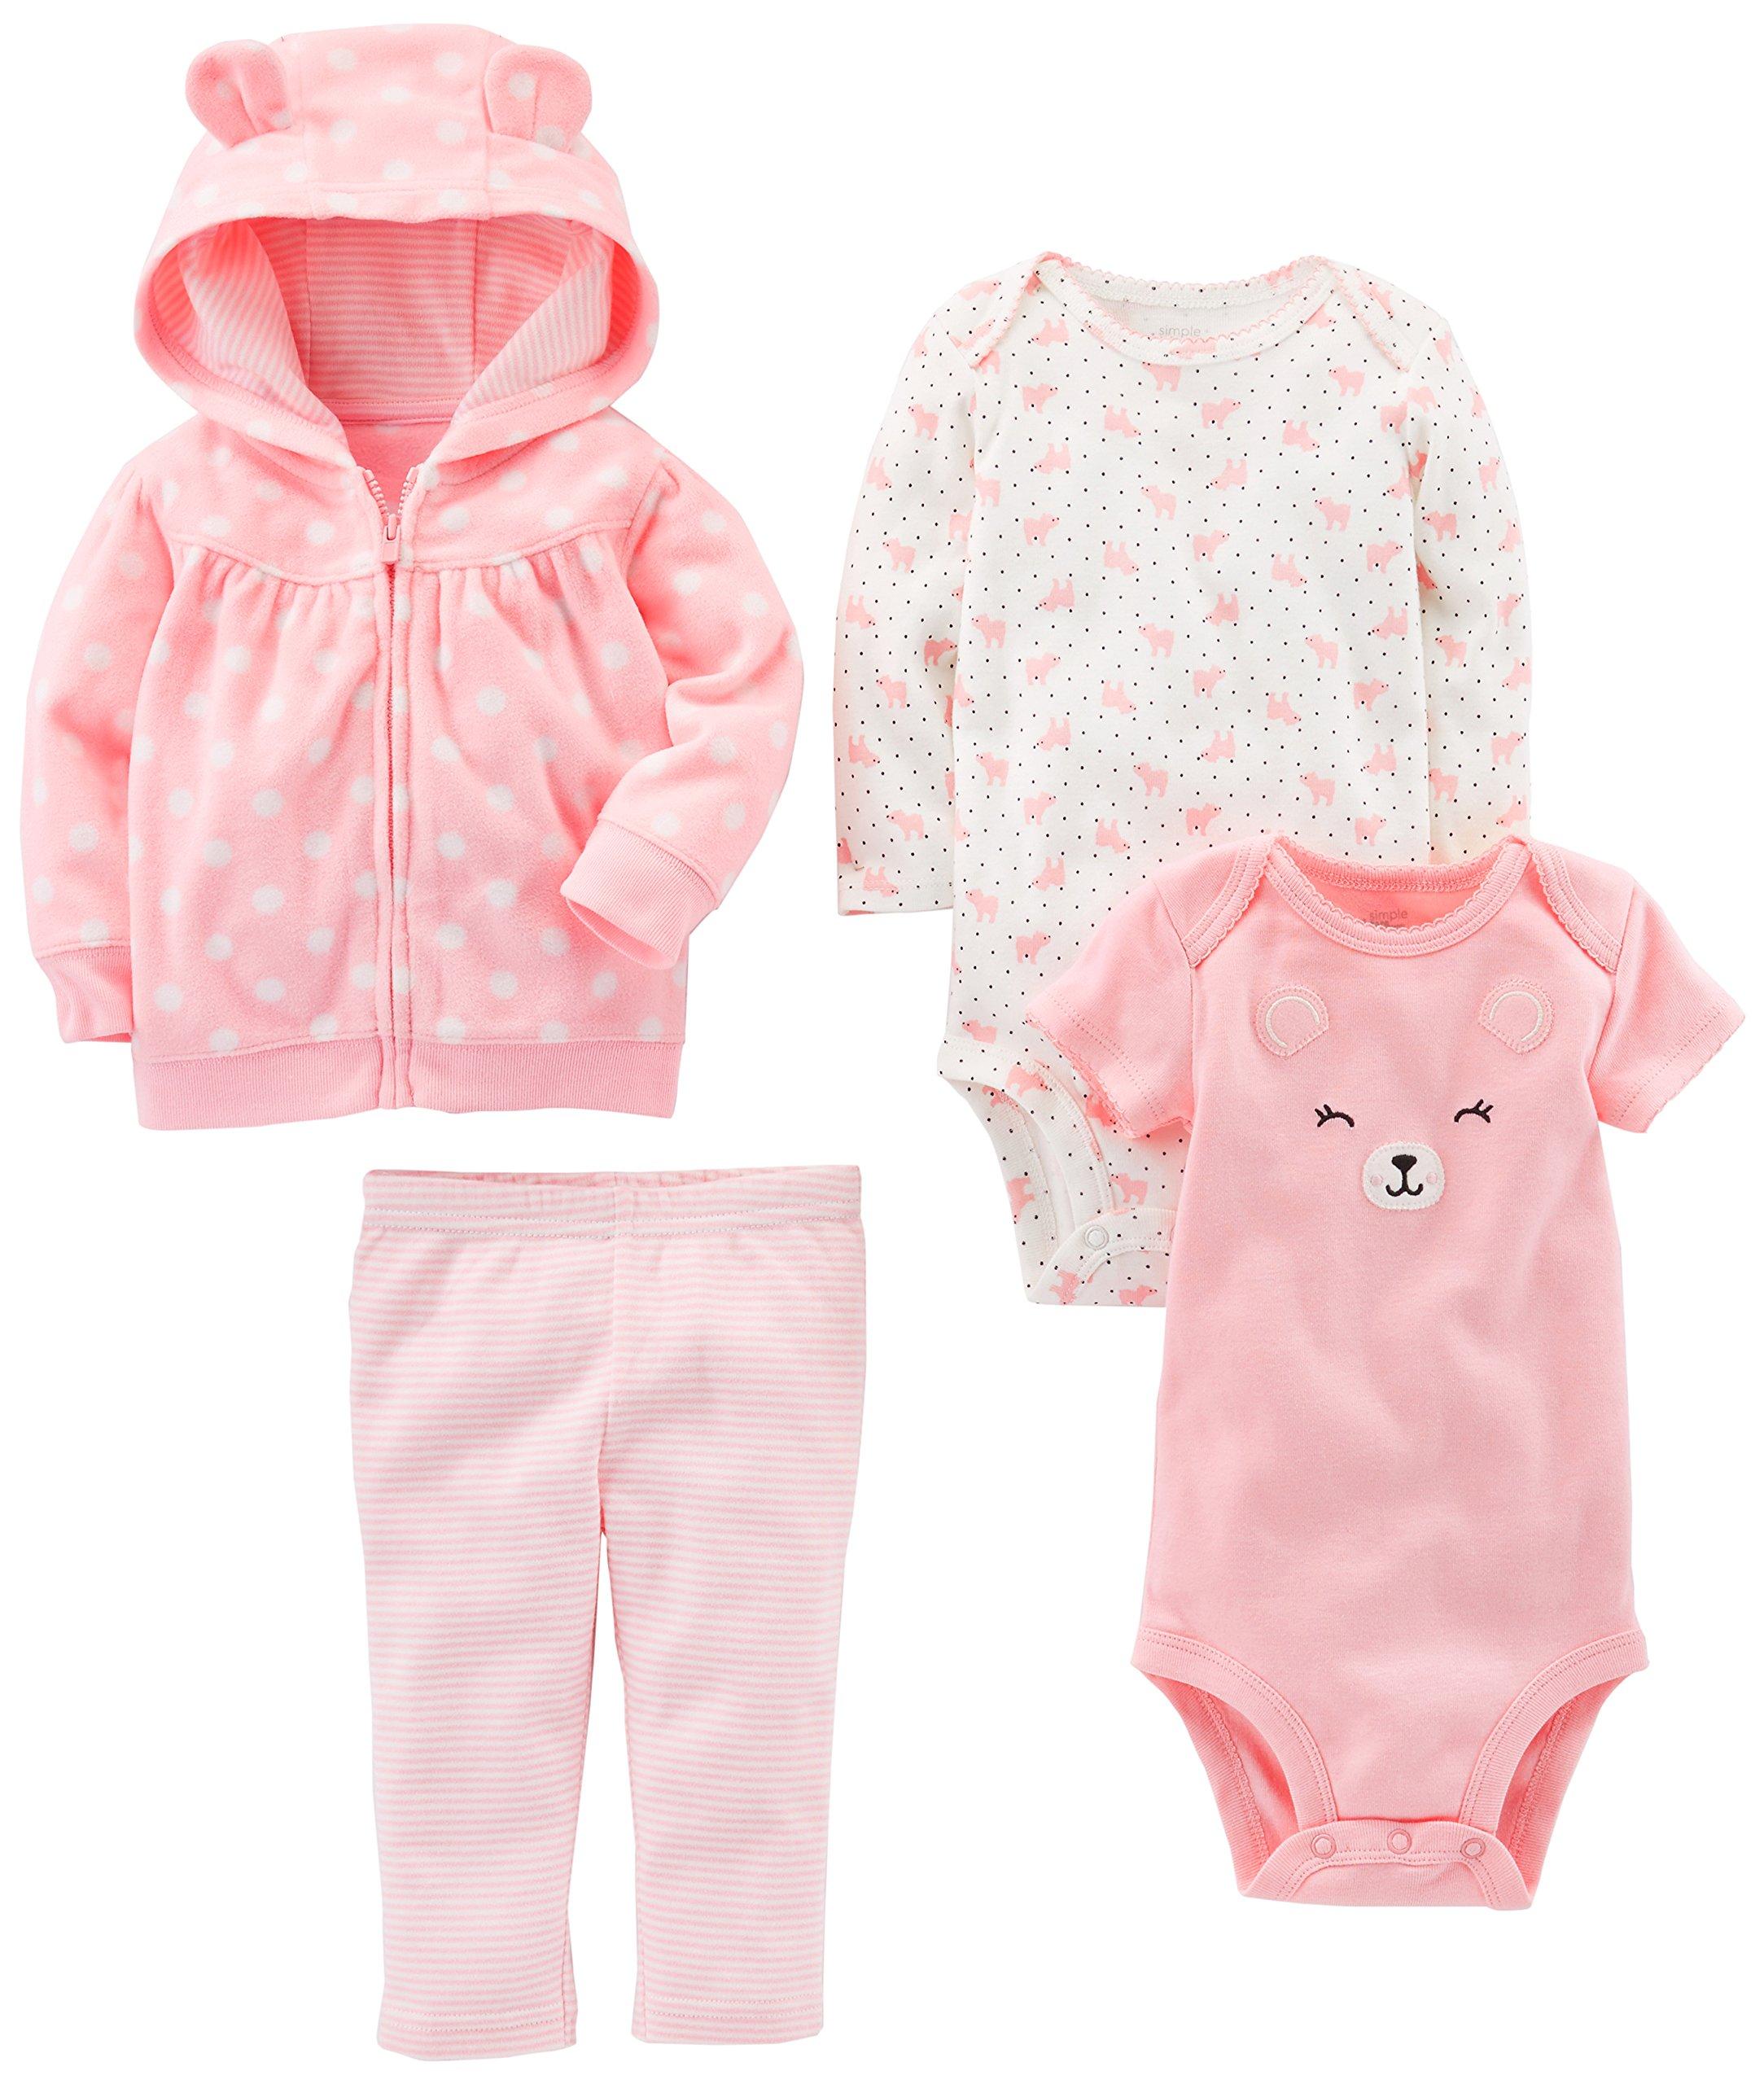 Simple Joys by Carter's Baby Girls 4-Piece Little Jacket Set, Pink Bear, 6-9 Months